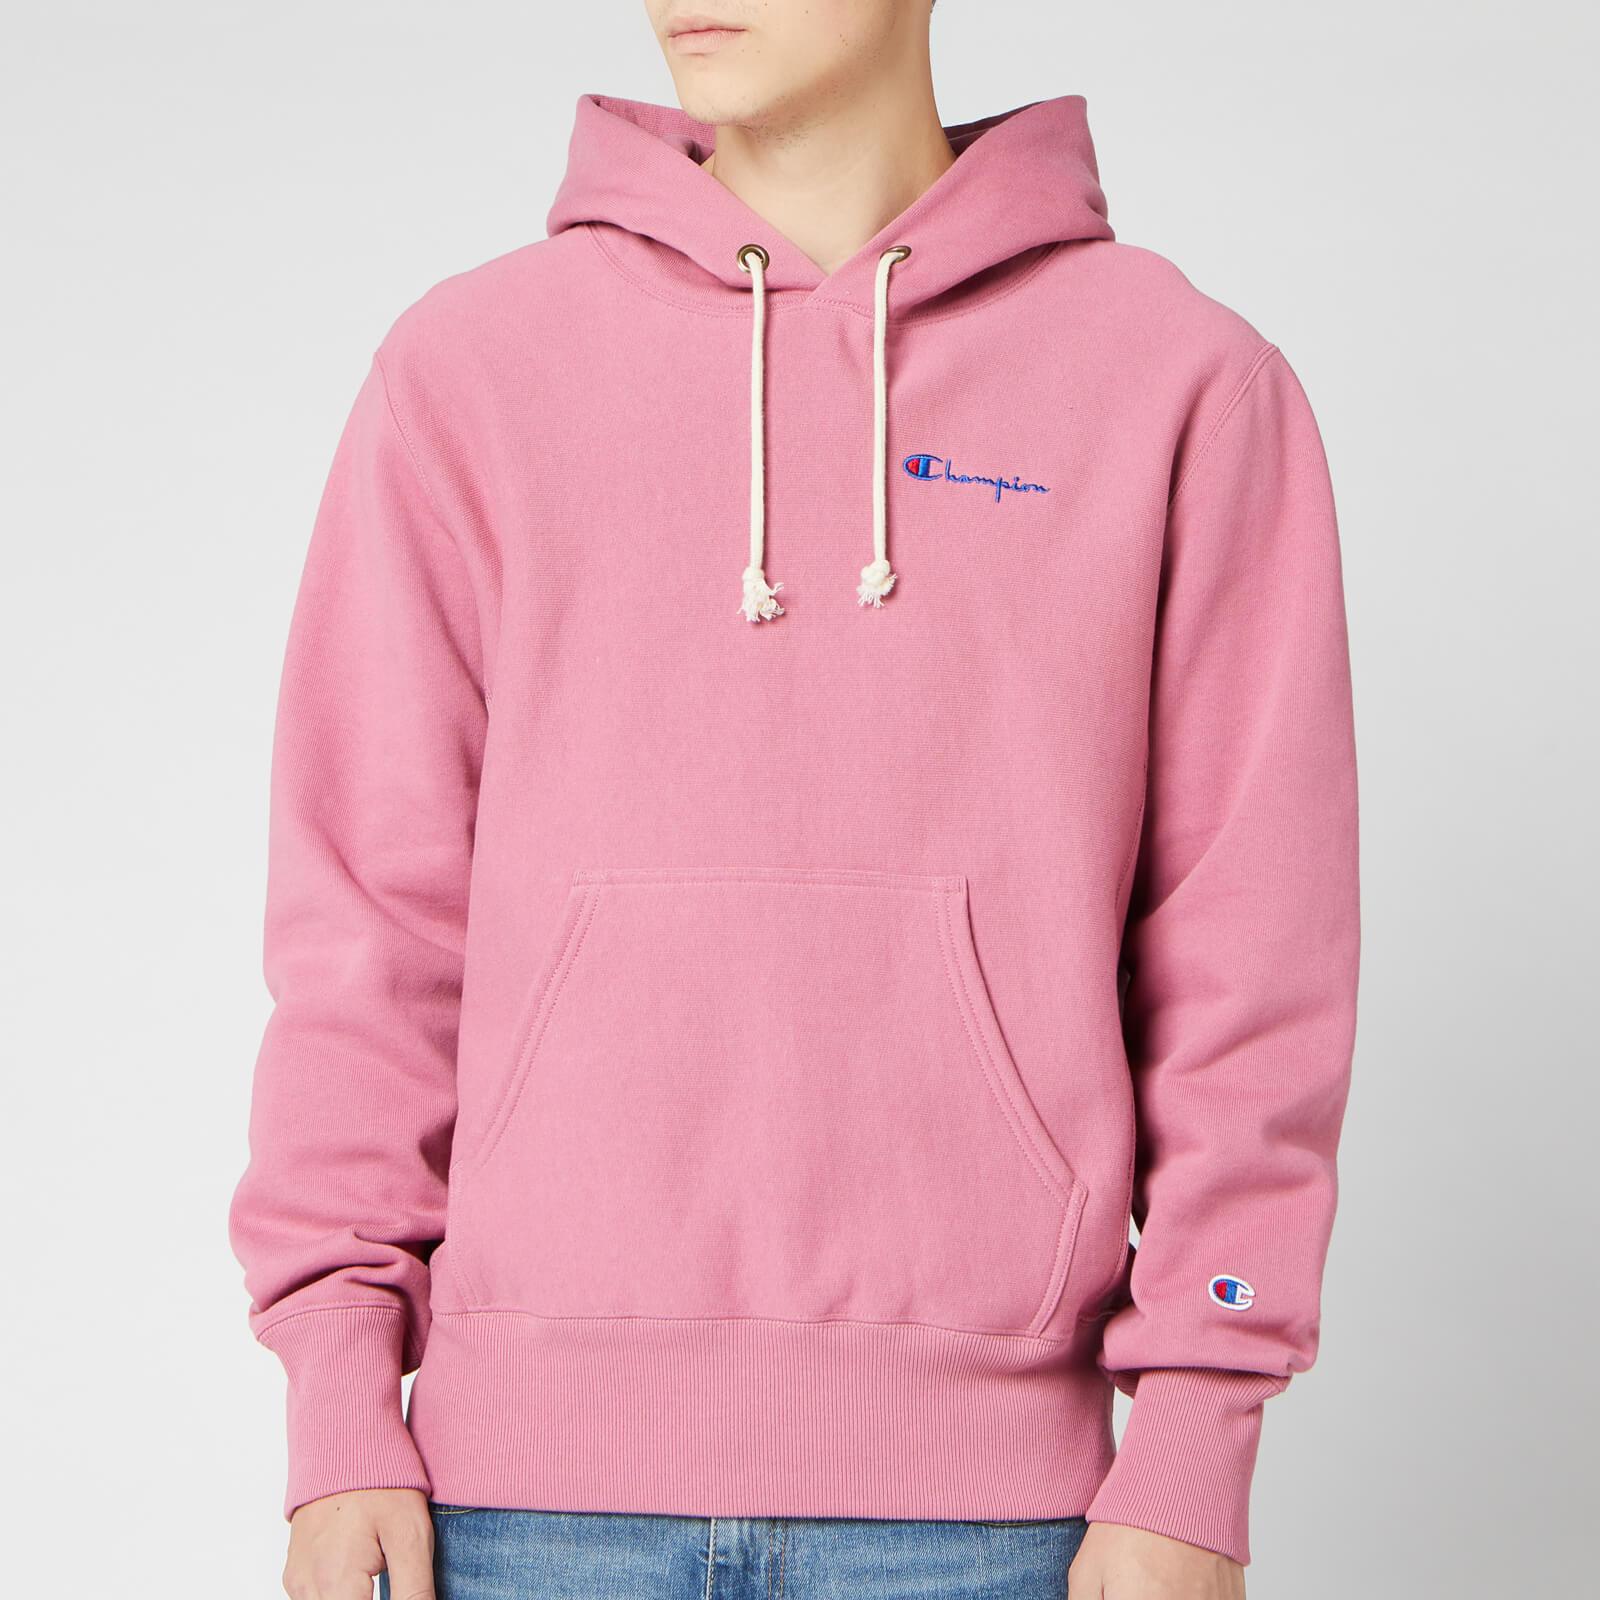 Champion Men's Small Script Hooded Sweatshirt - Pink - L